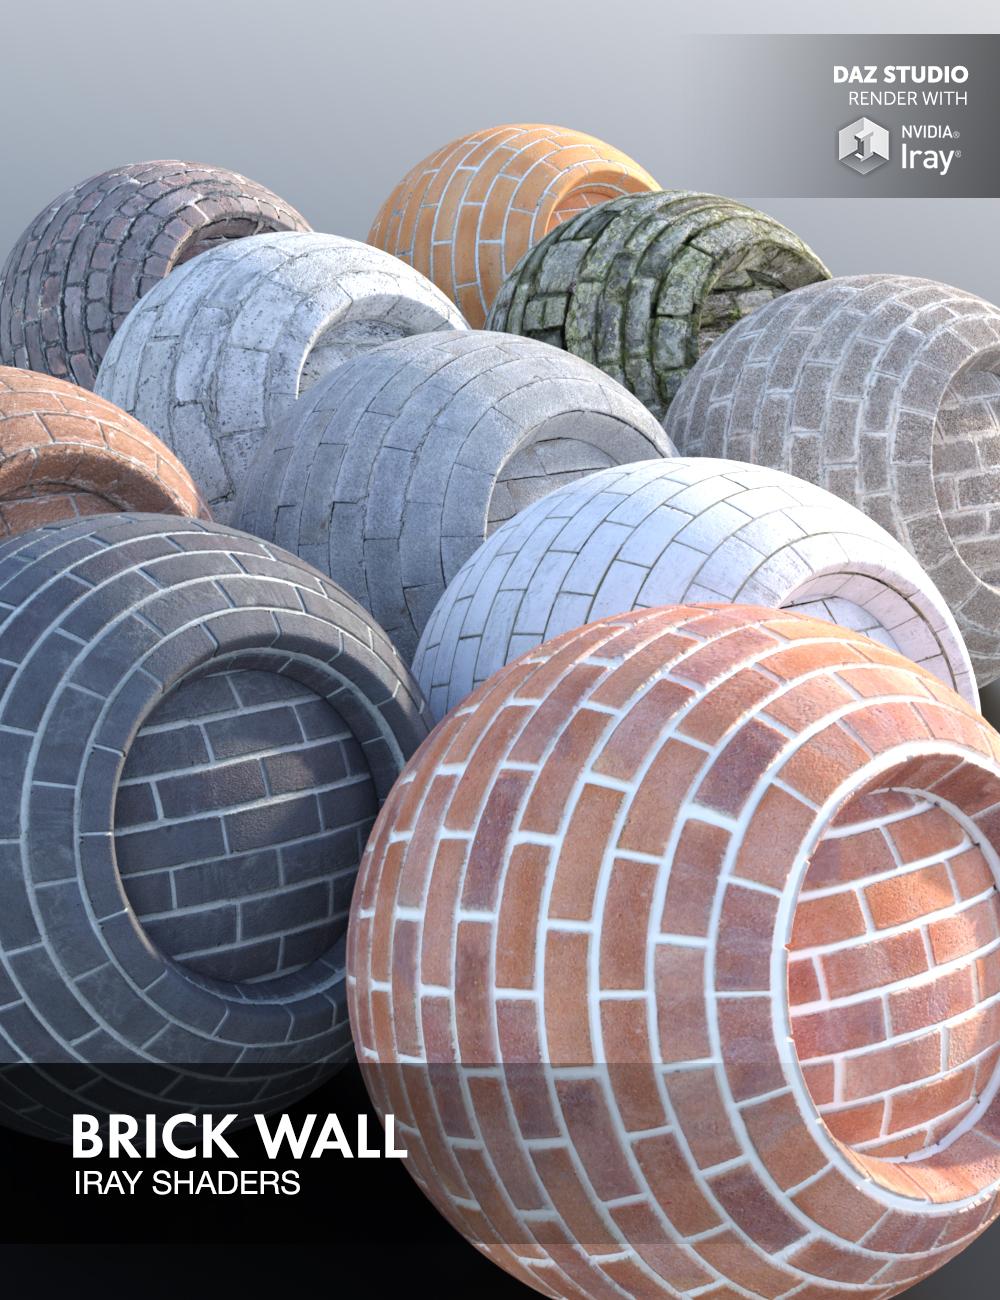 Brick Wall - Iray Shaders by: Dimidrol, 3D Models by Daz 3D